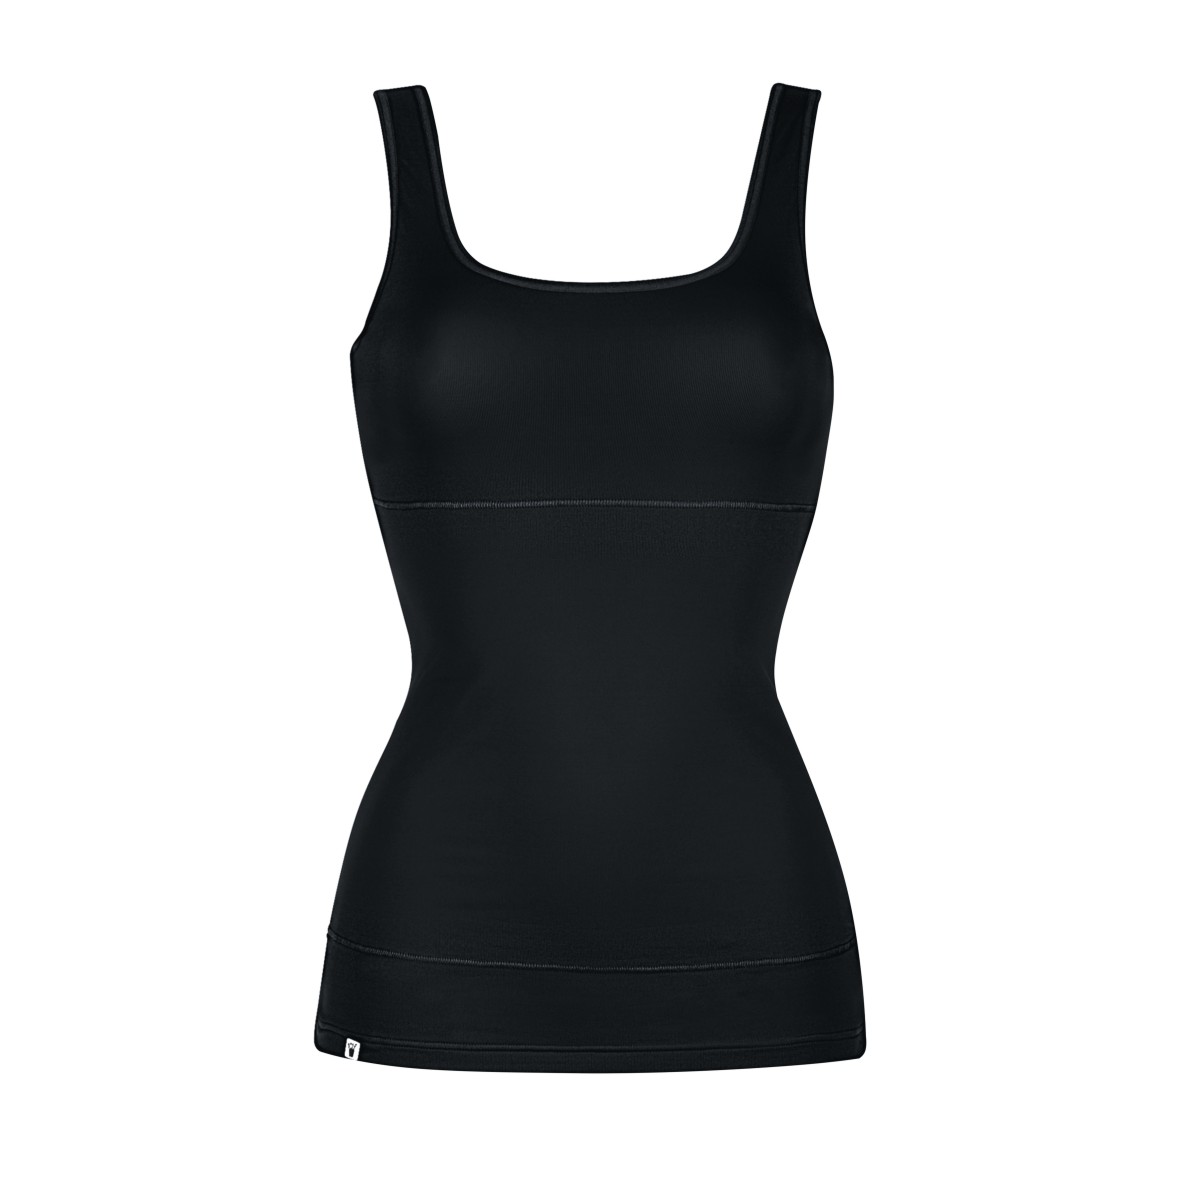 5a8b830db0d5f Triumph Trendy Sensation Shirt 02 - Siemers Online-Shop